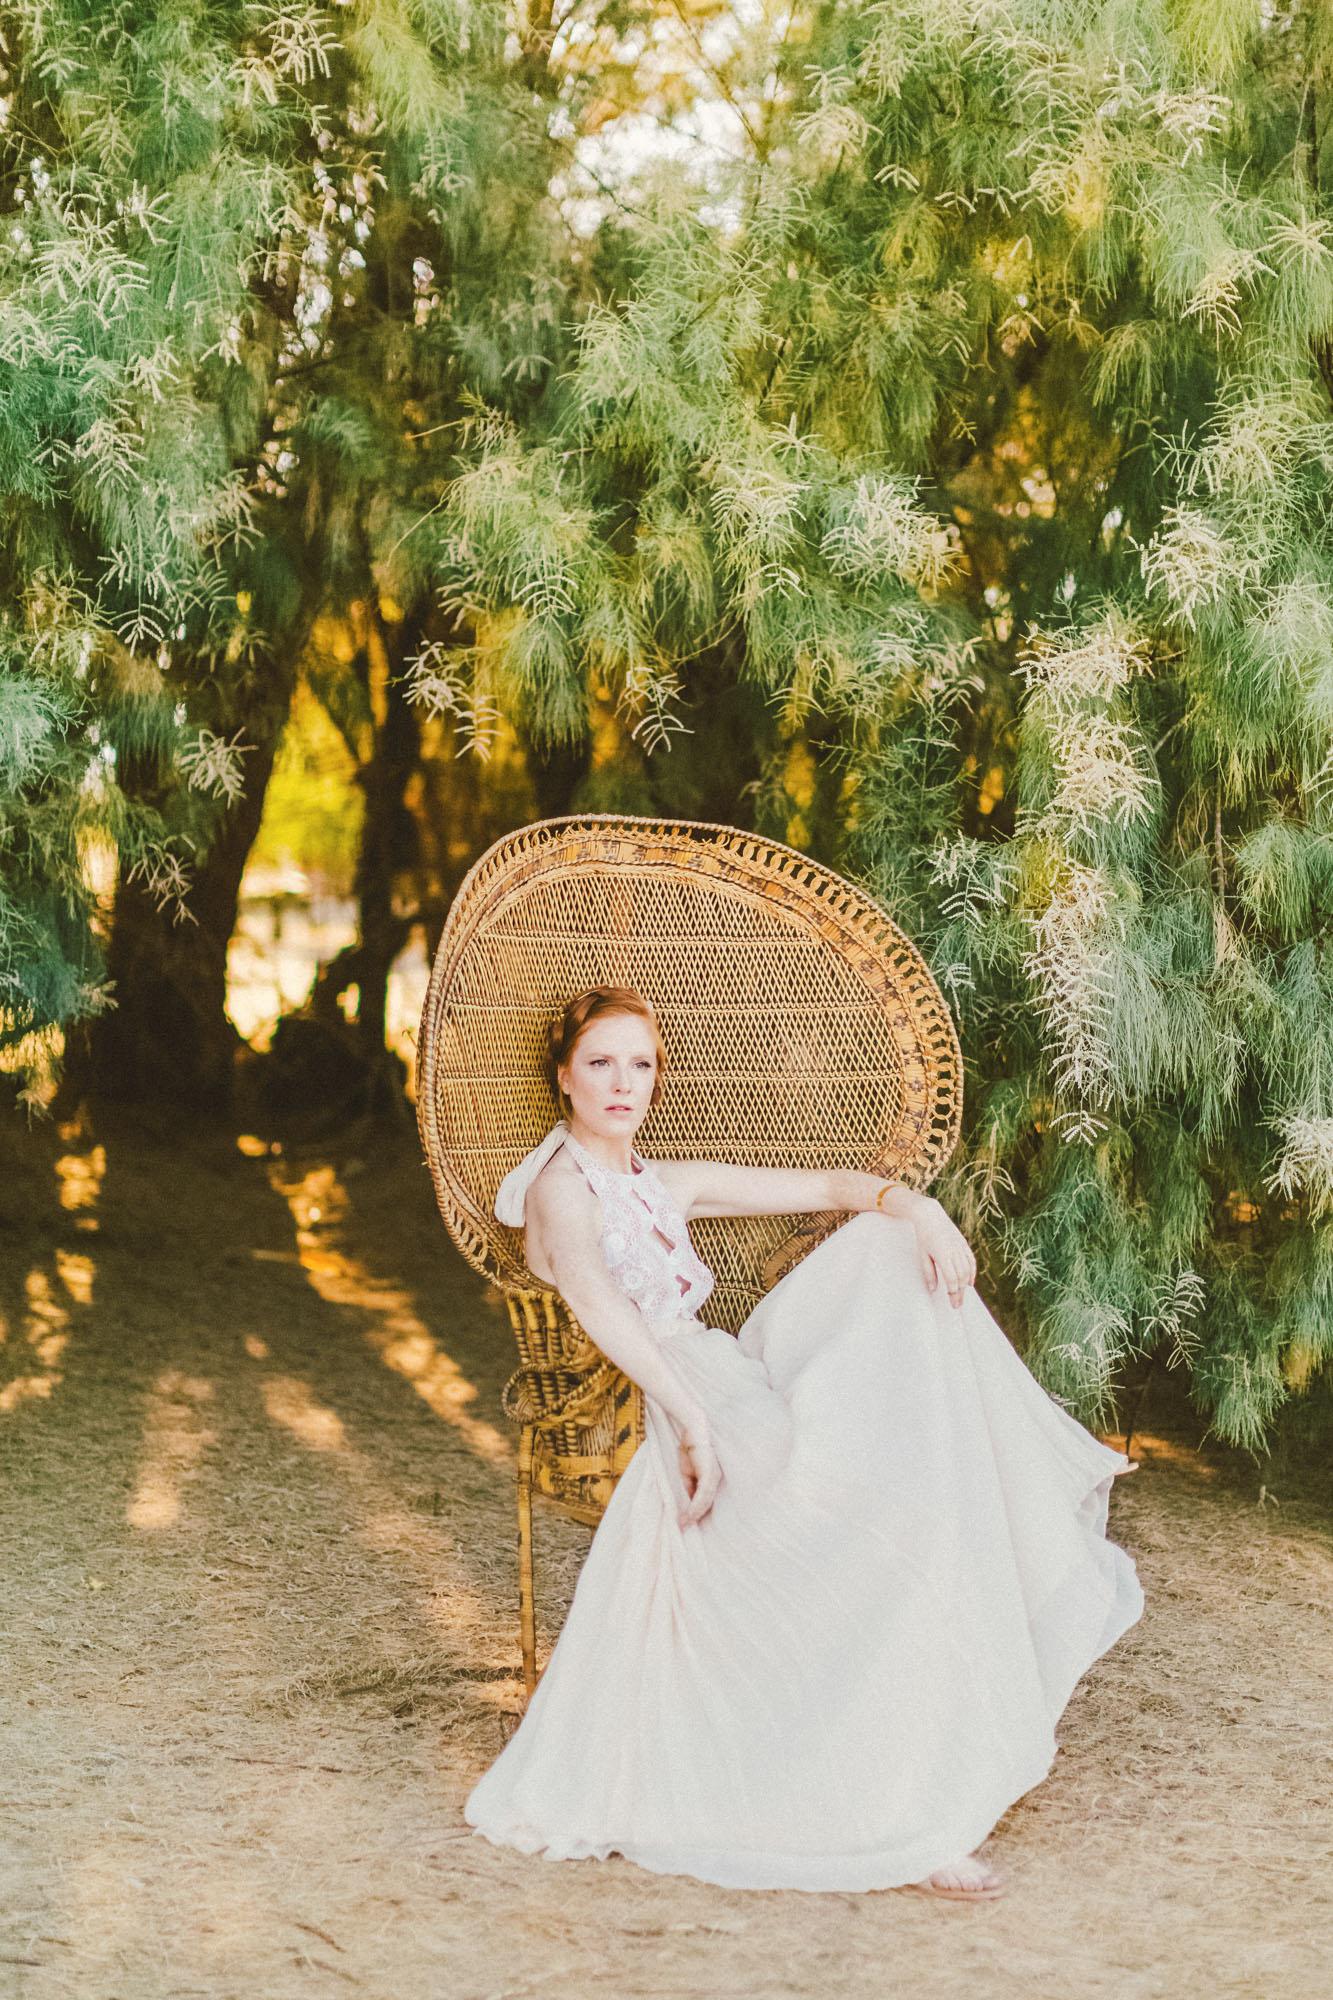 California desert wedding inspiration